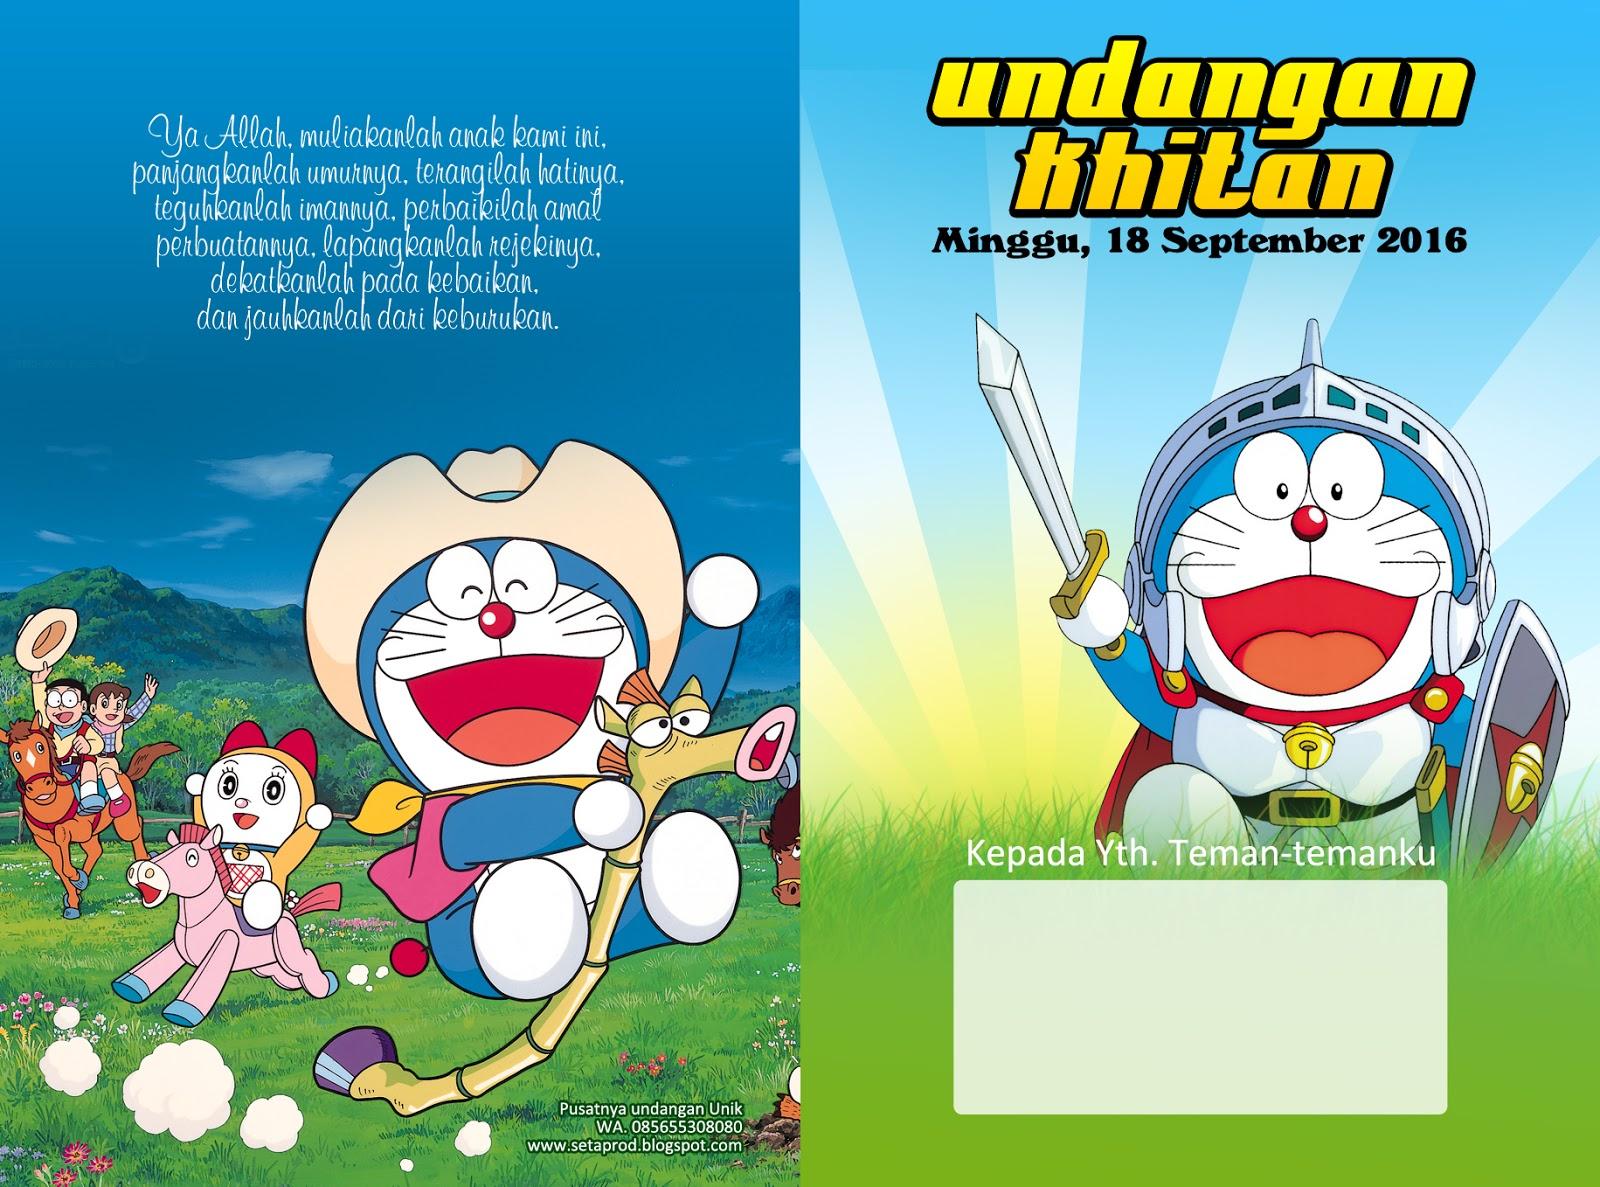 Percetakan Lamongan Undangan Khitan Kartun Animasi Anak Anak